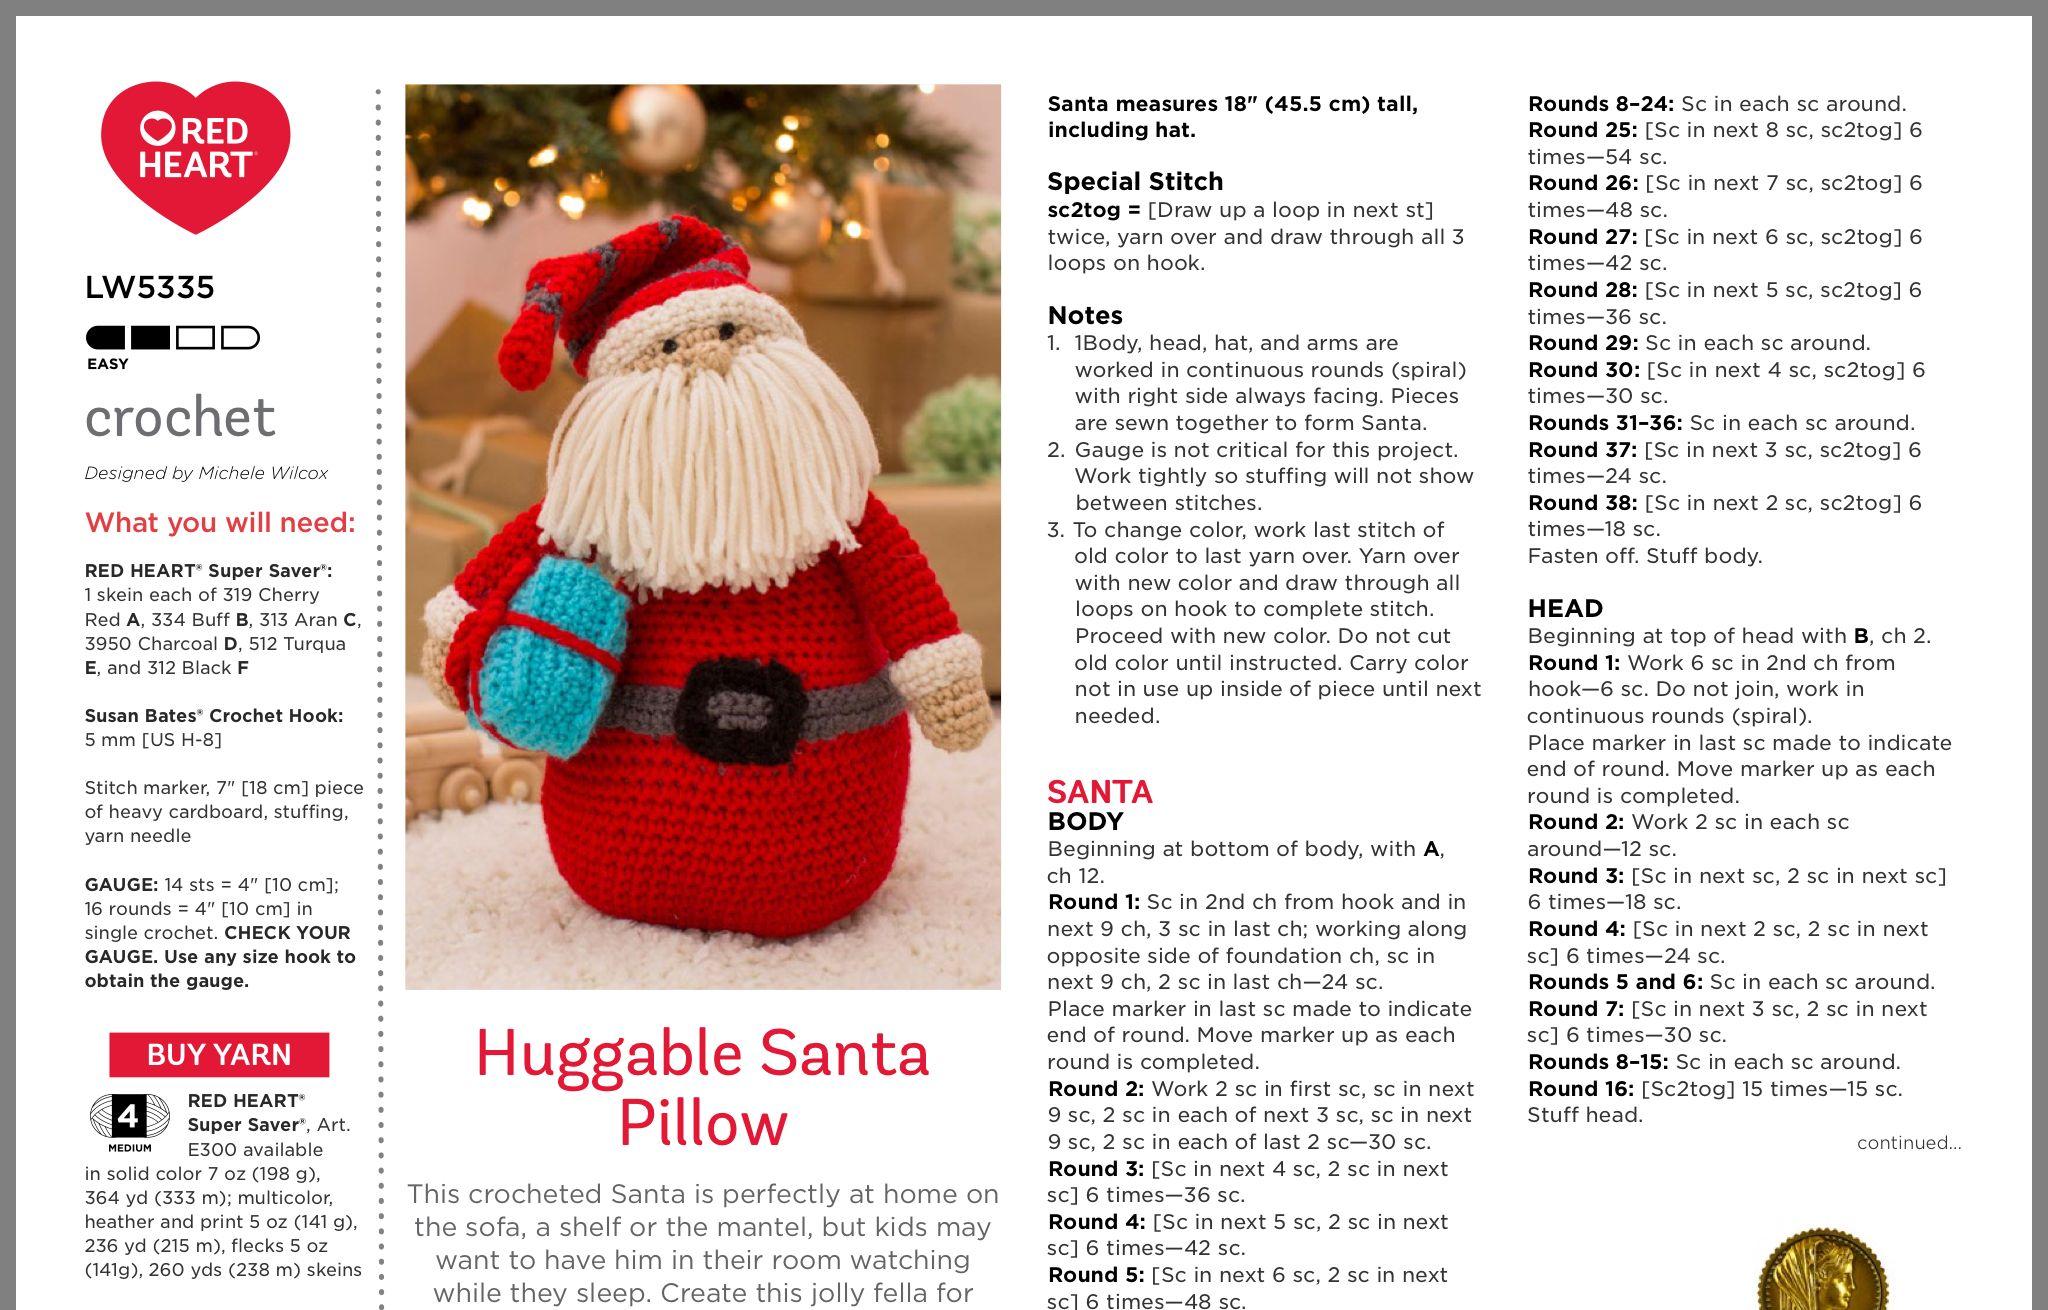 Pin de Ken & Kathy Story en Knitting and crocheting | Pinterest ...